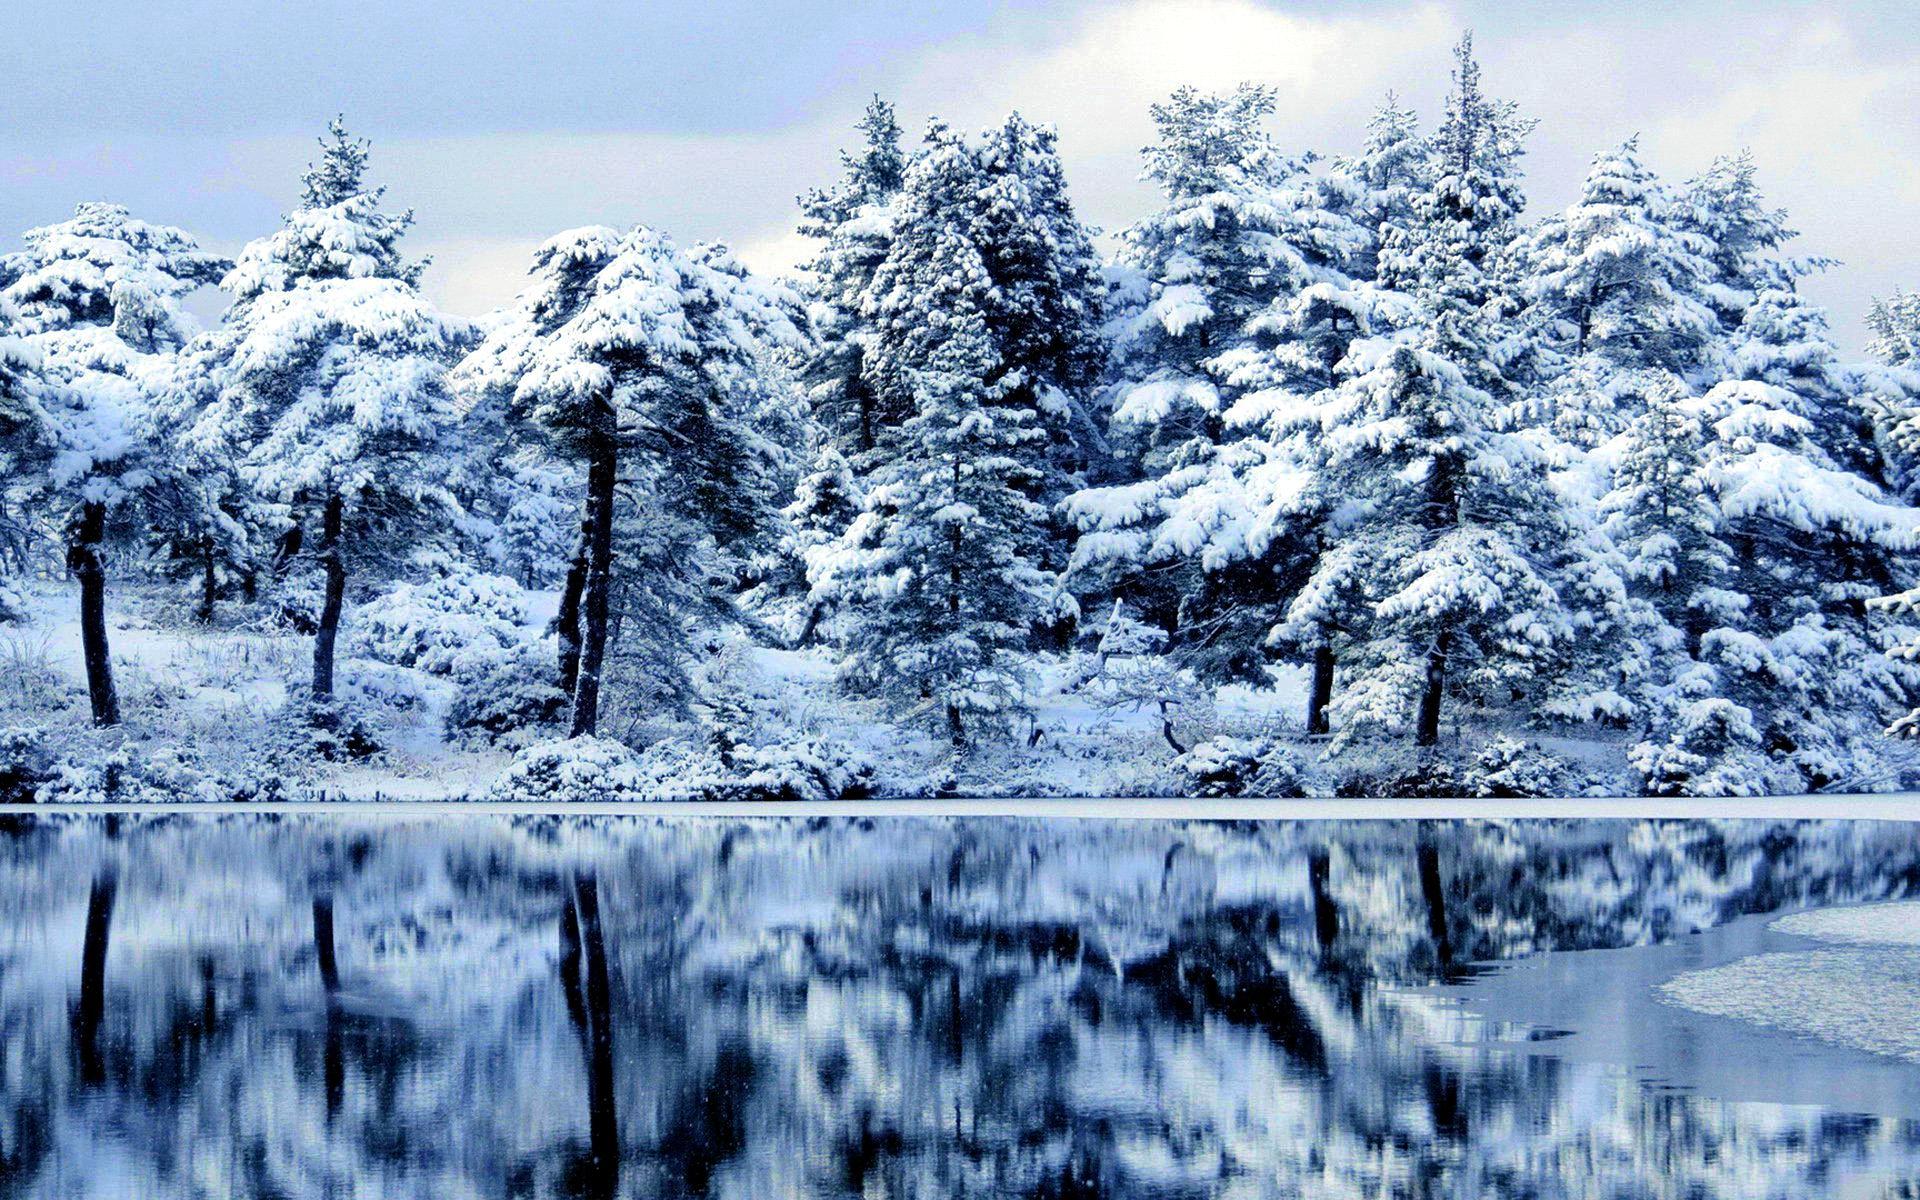 Download Free 3d Live Wallpaper For Windows Xp Forest Wallpaper Snow Winter Hd Desktop Wallpapers 4k Hd